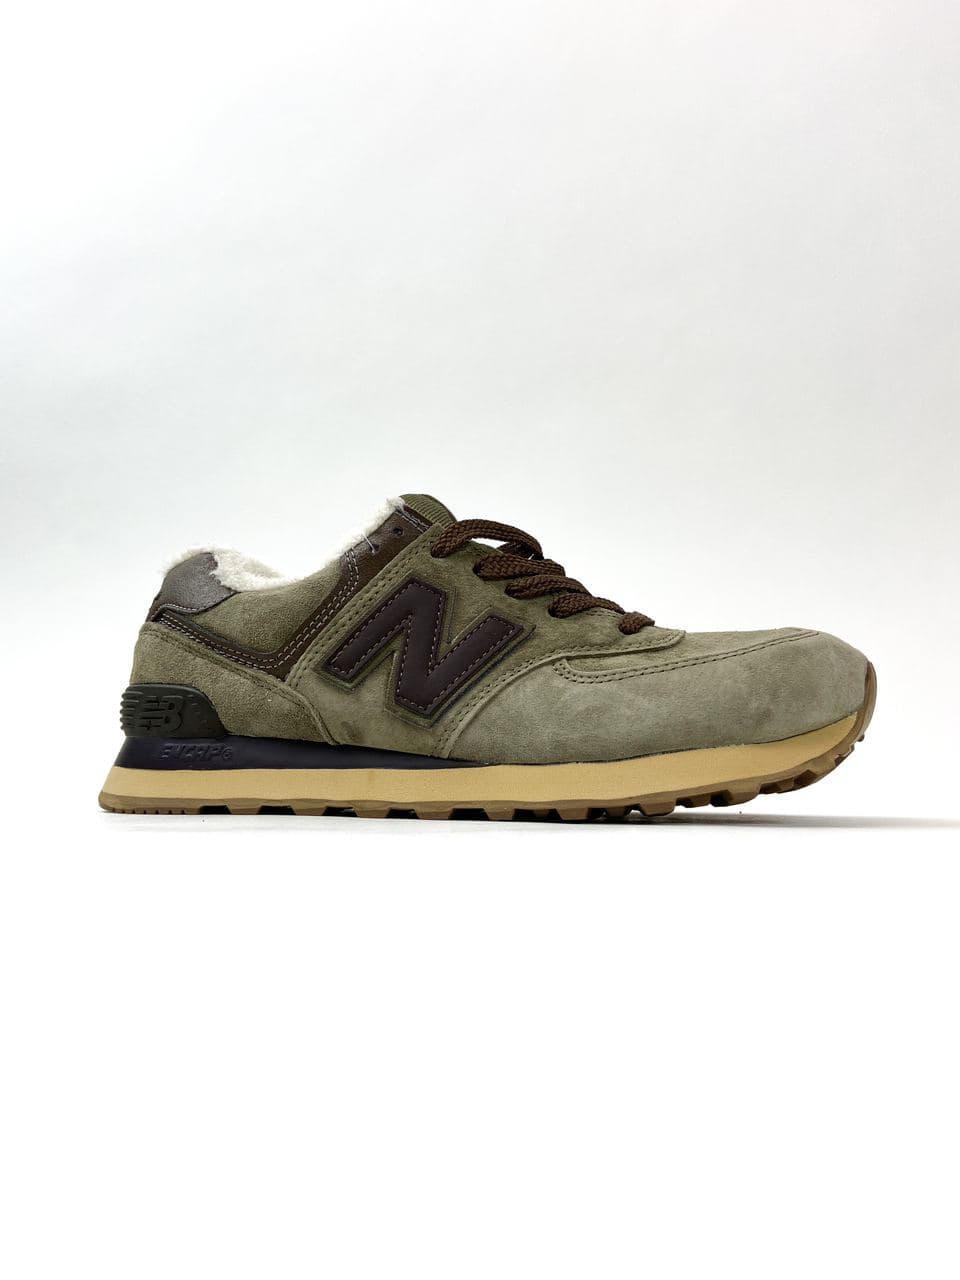 New Balance 574 Green Brown (Мех) (Зеленый)